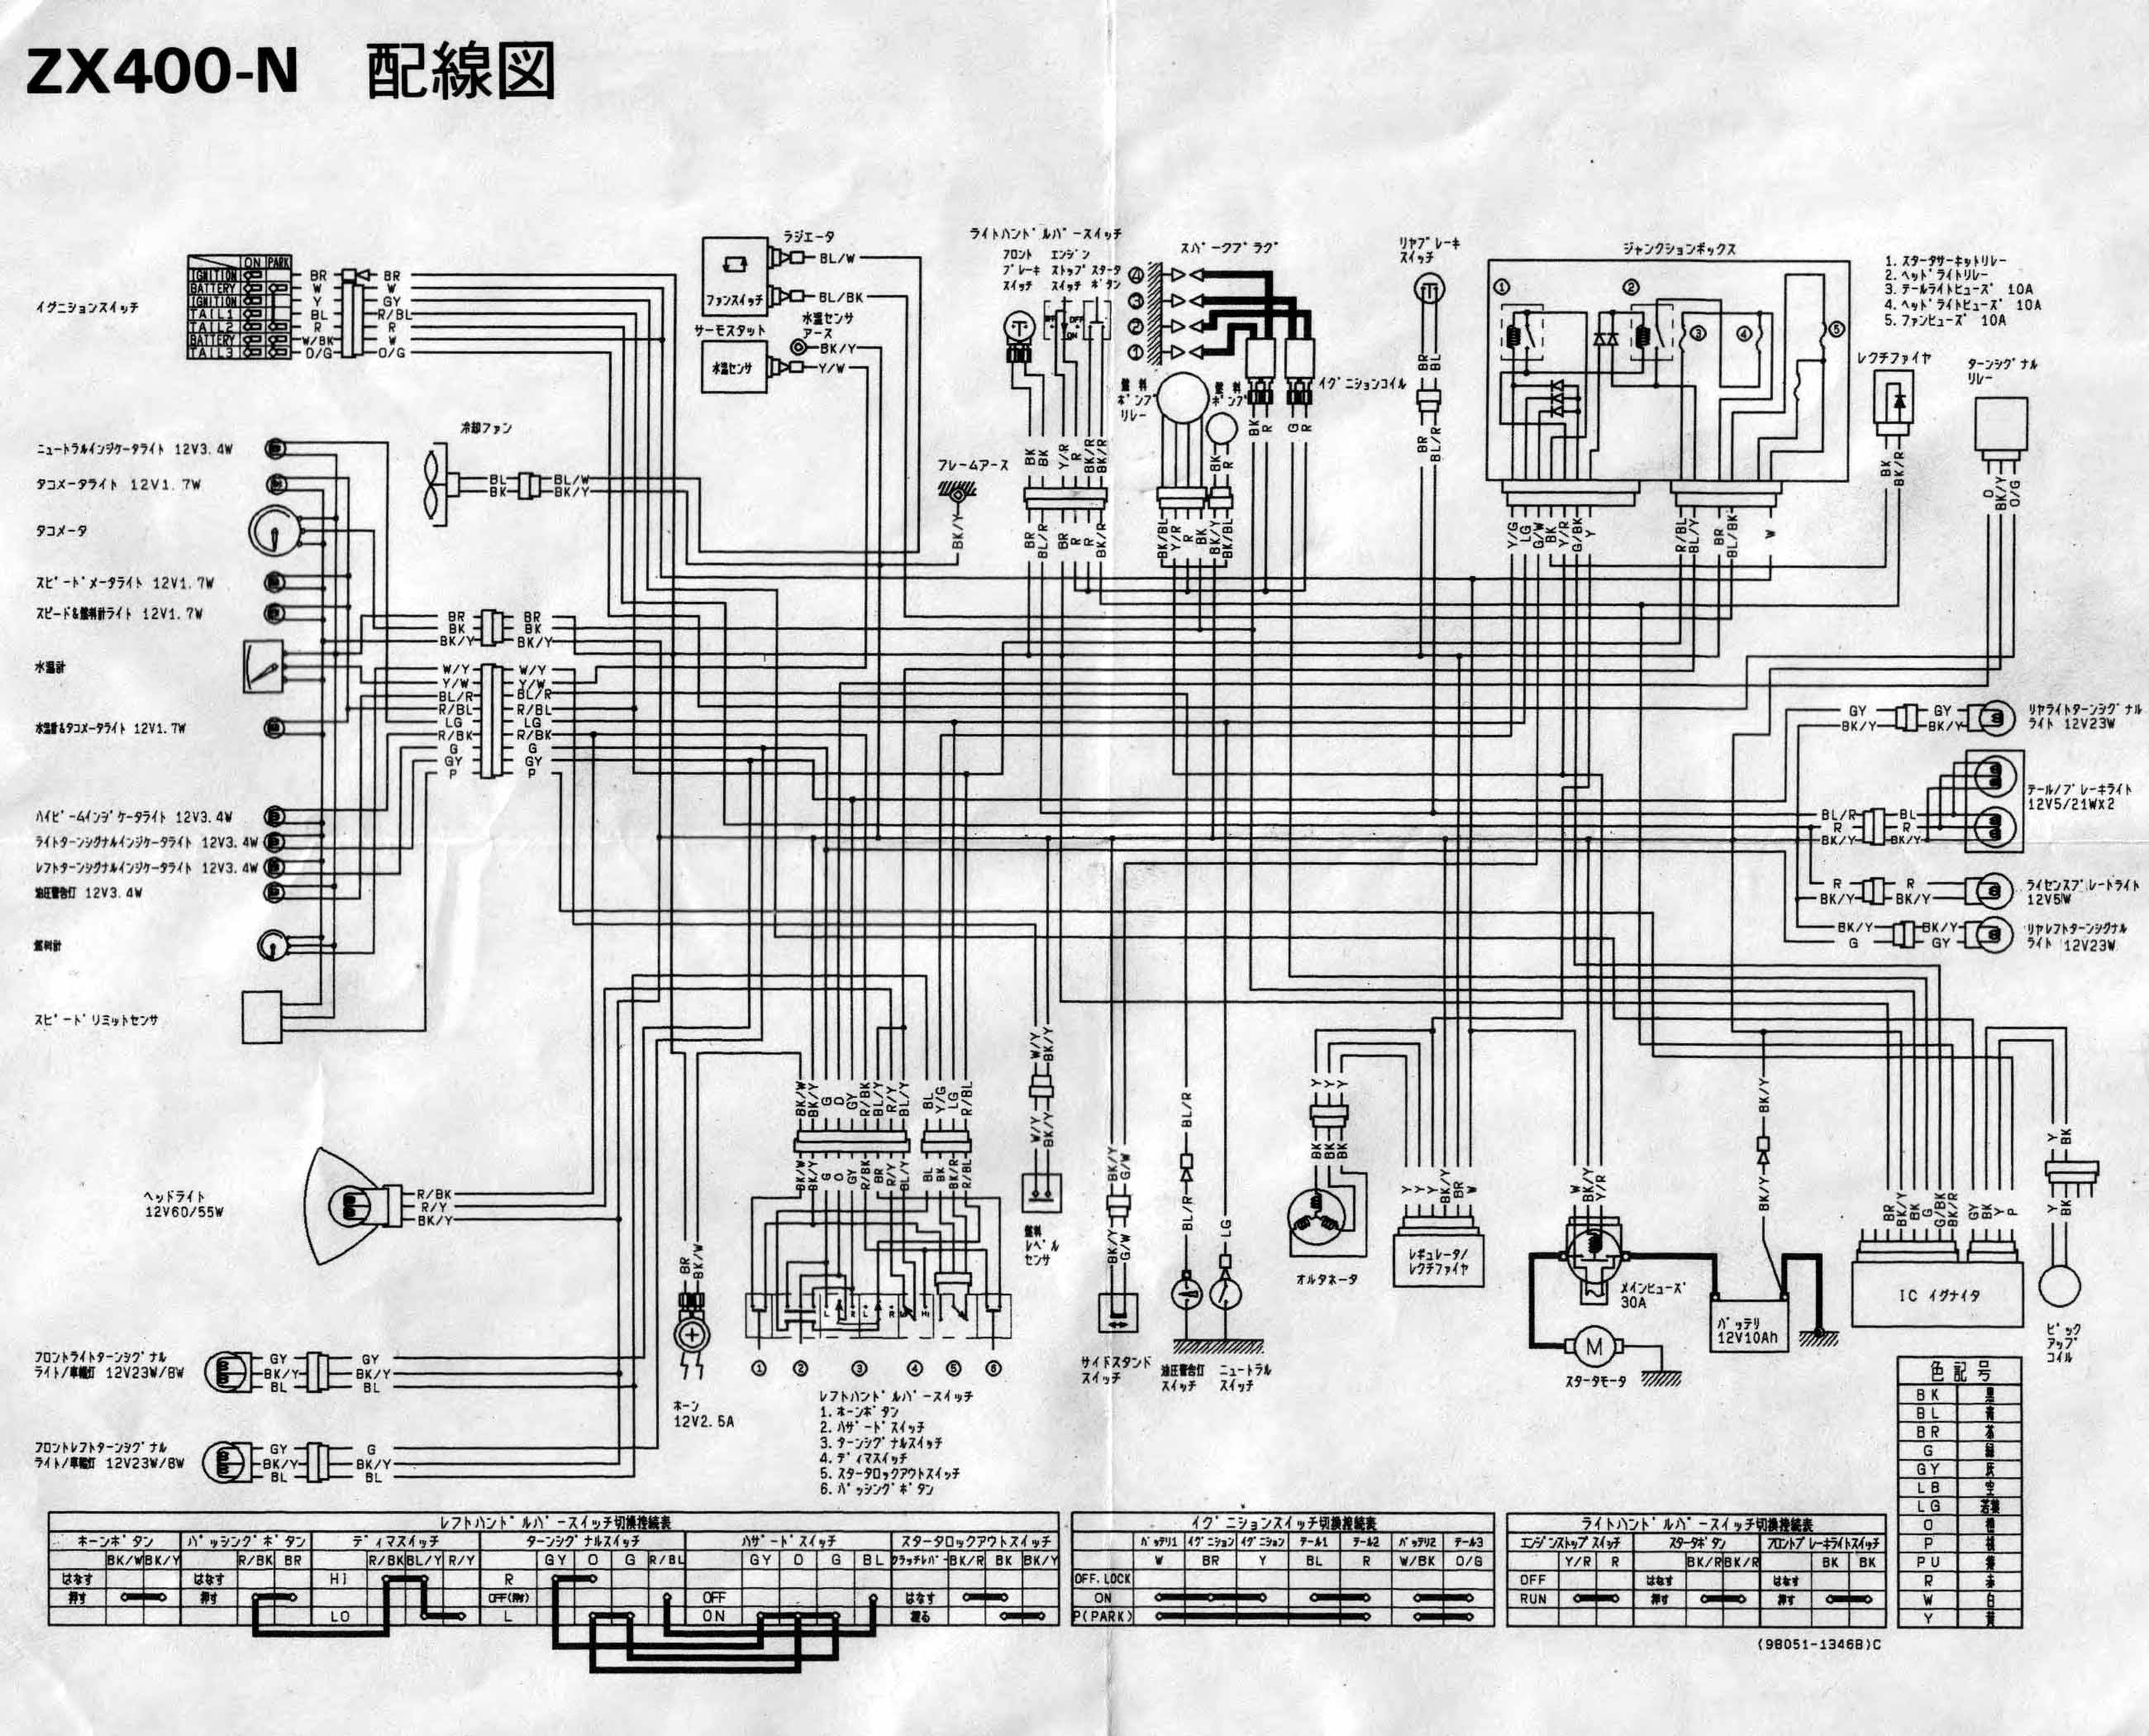 kawasaki zx7 wiring diagram download wiring diagrams u2022 rh sleeperfurniture co